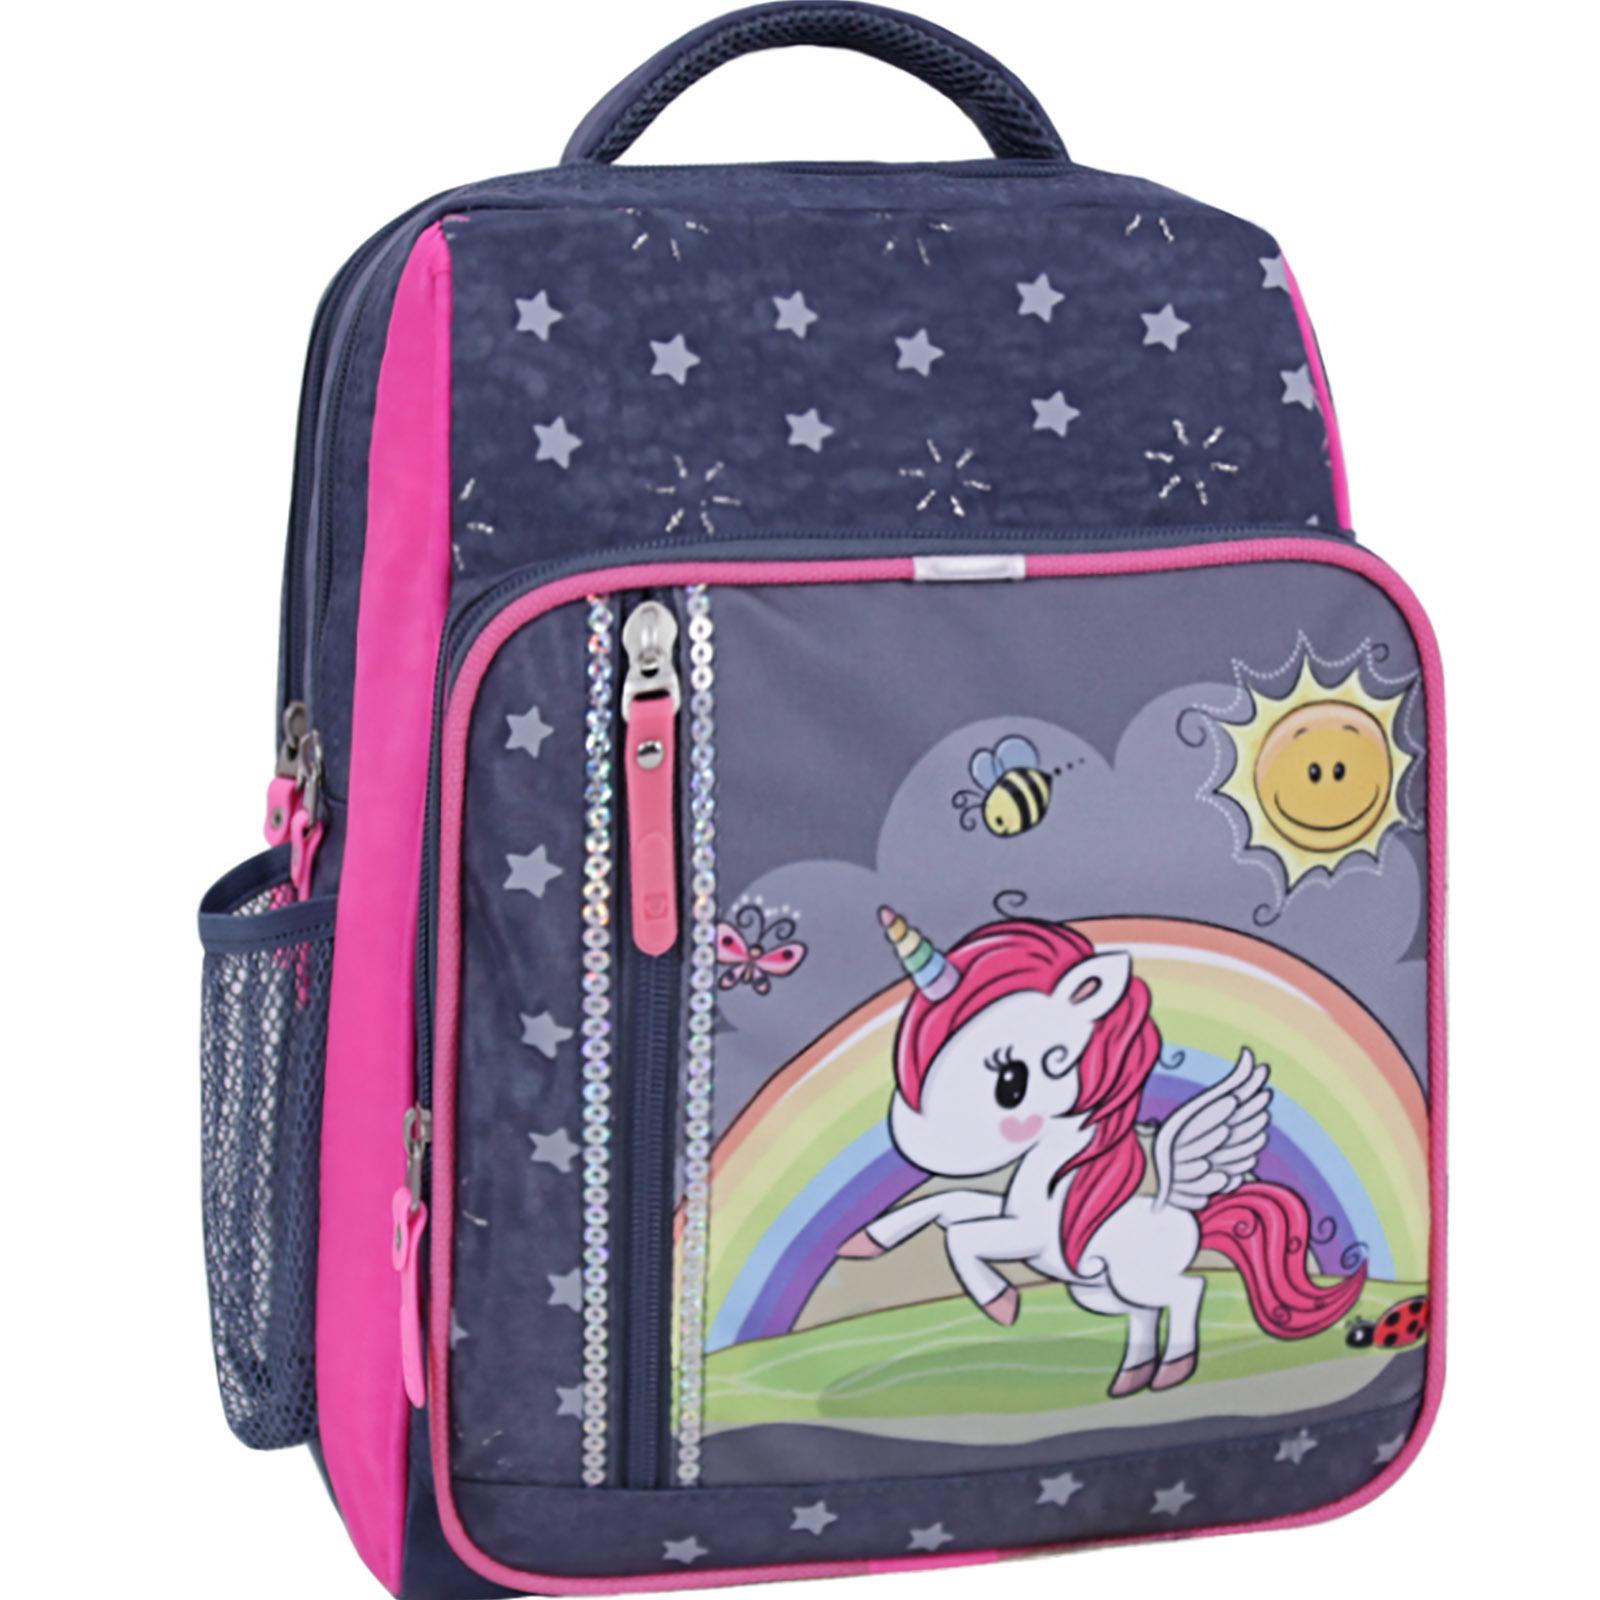 Школьные рюкзаки Рюкзак школьный Bagland Школьник 8 л. 321 серый 680 (0012870) IMG_2769_суб.680_-1600.jpg